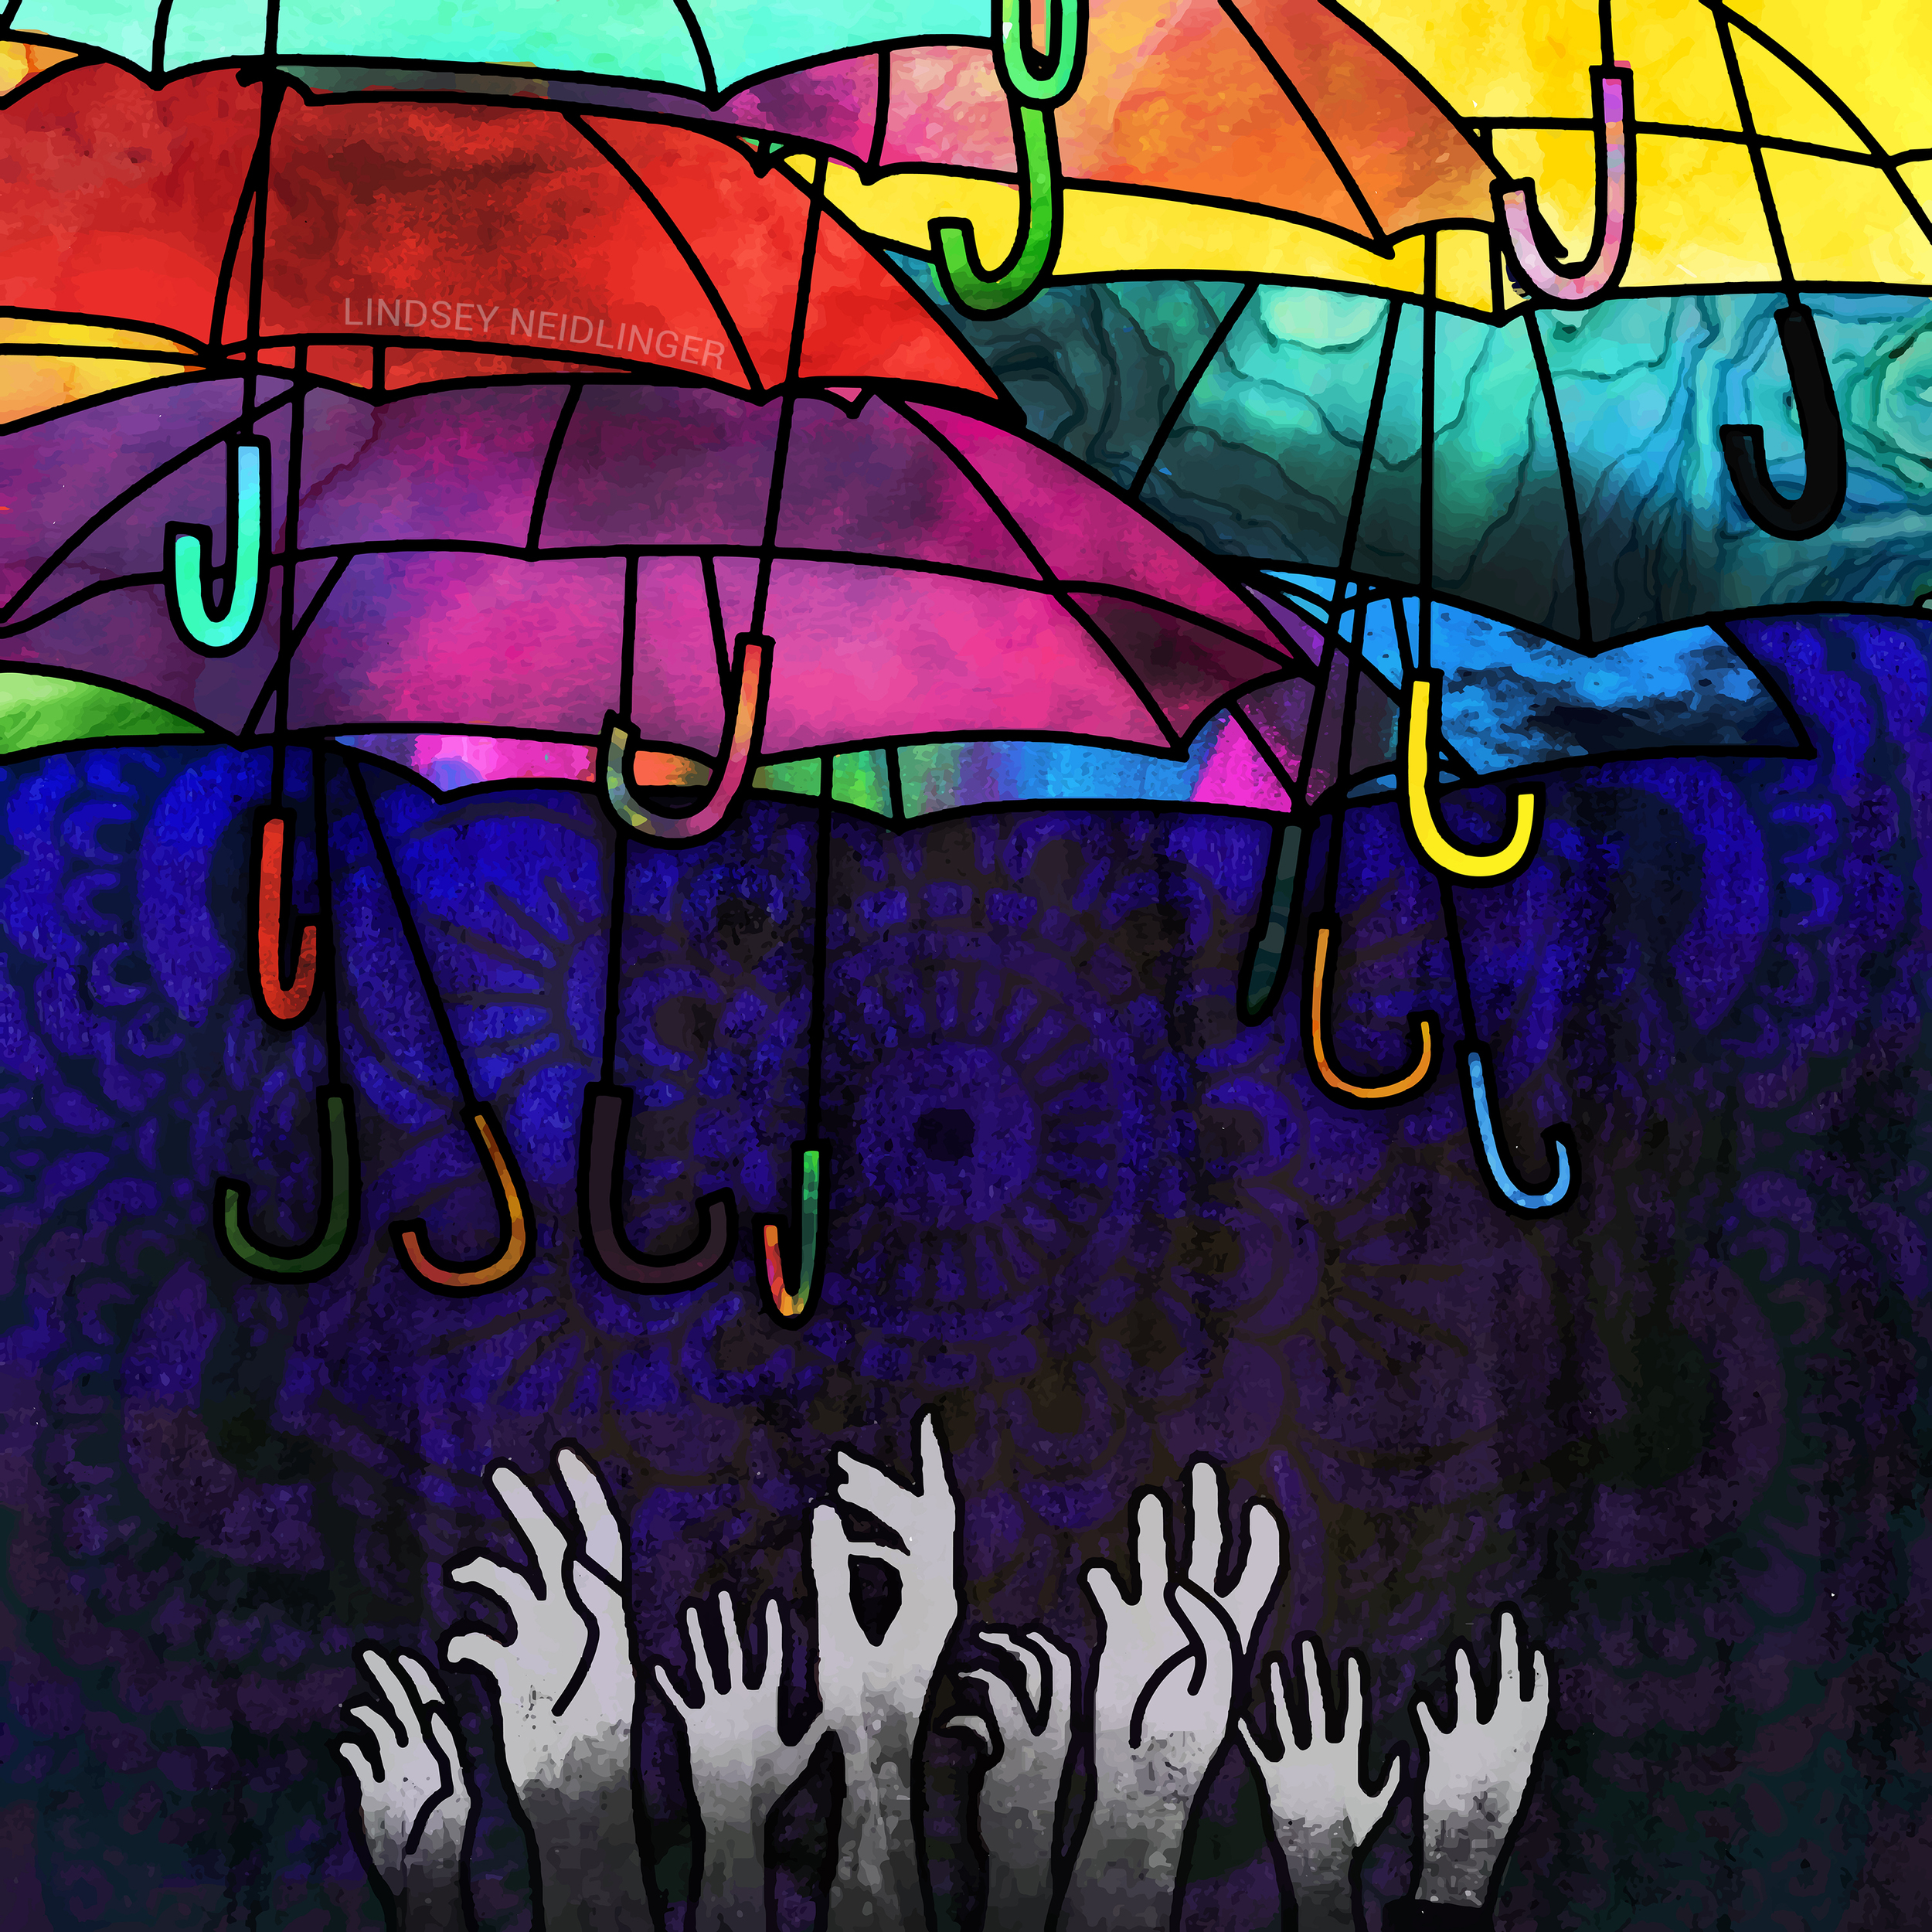 umbrellas (resized).jpg